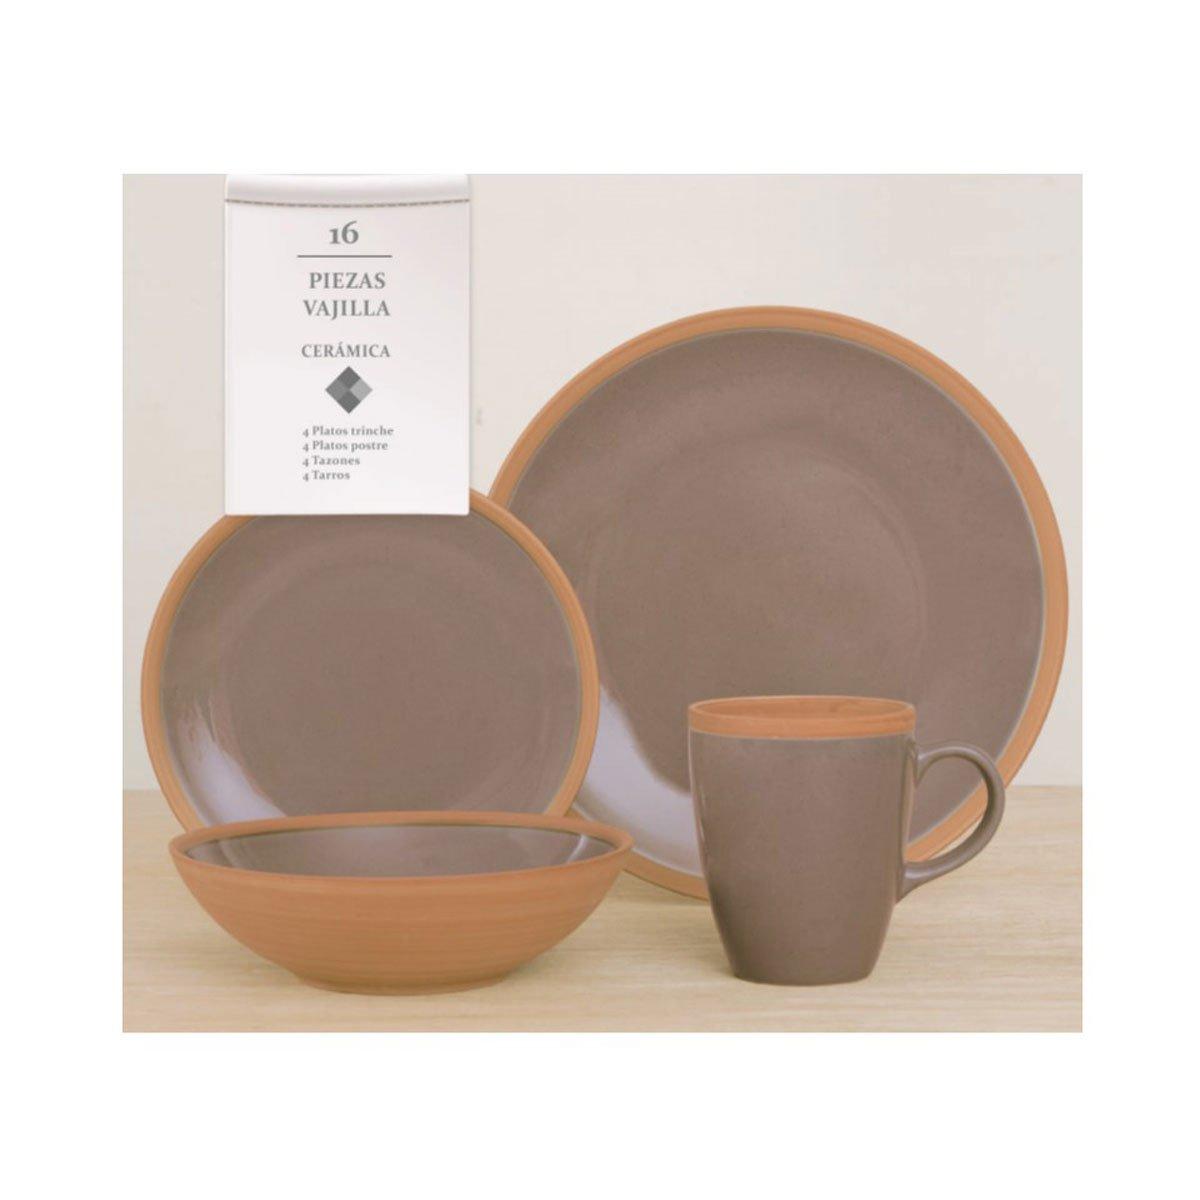 Vajilla 16 piezas ceramica beige mug master sears com mx for Vajilla ceramica